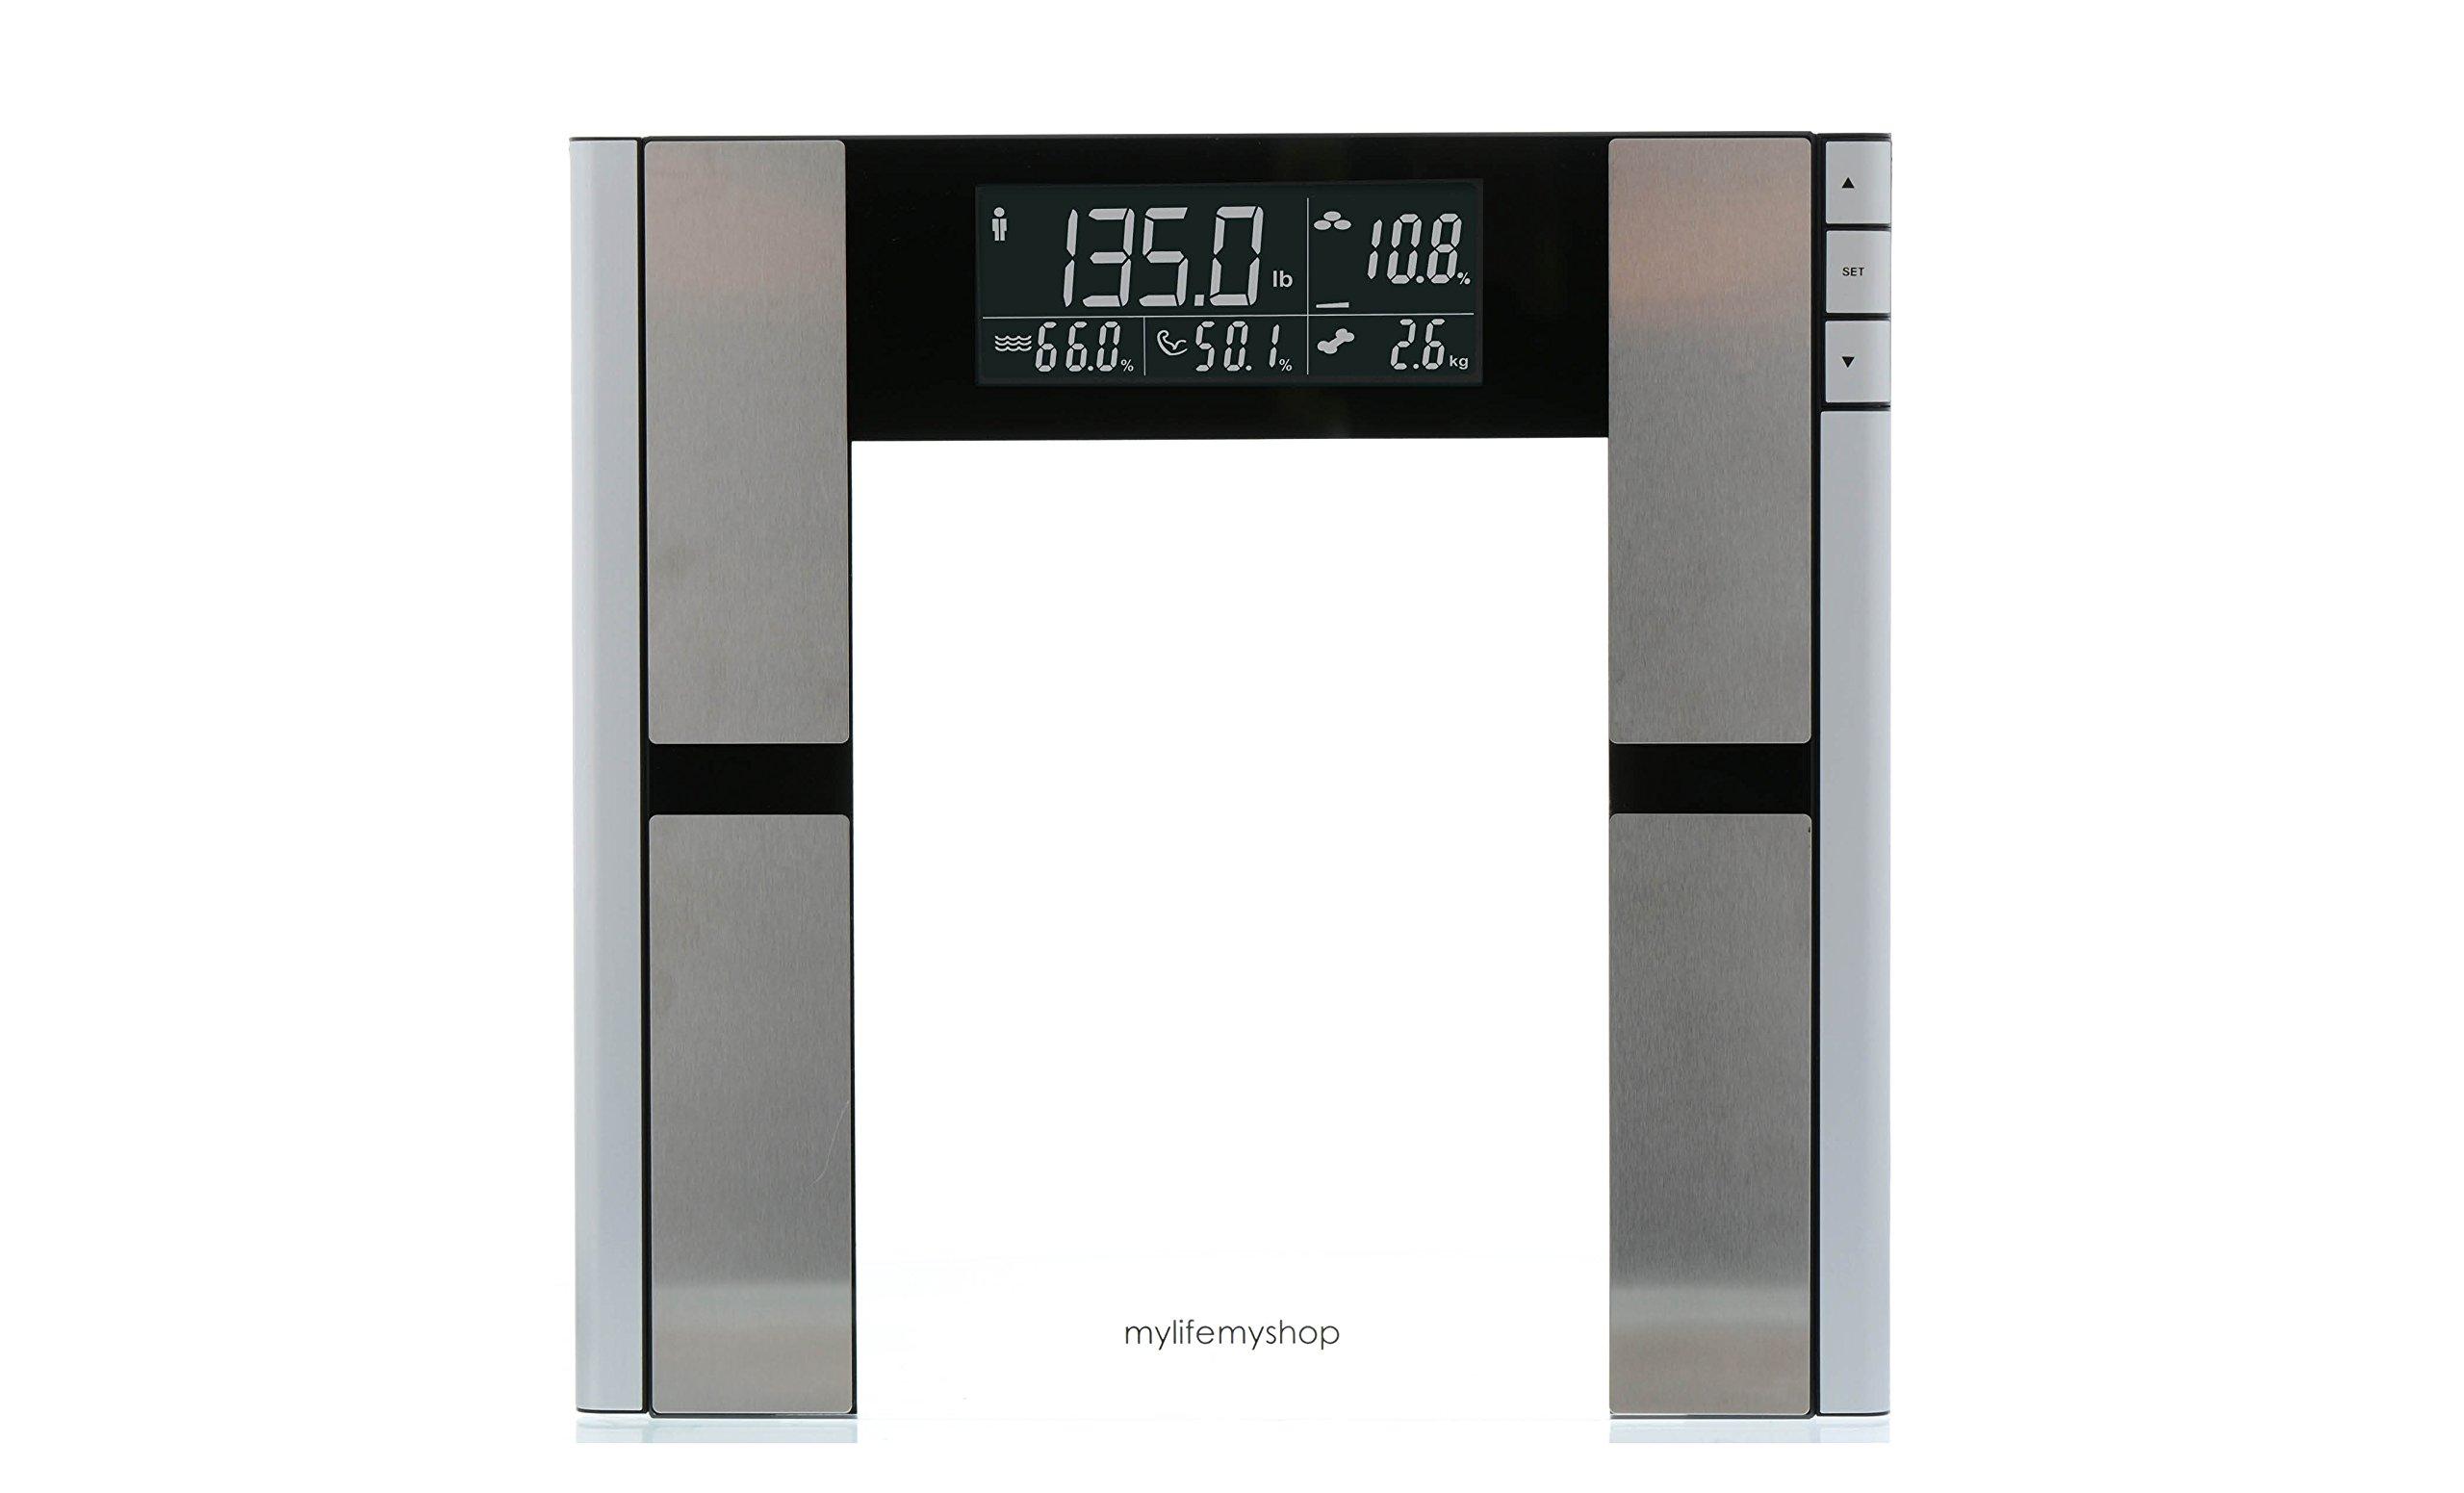 My Life My Shop Body Analyzer1 Digital Scale - Body Fat, Weight, Muscle/Bone Mass, Water Weight Tracker by My Life My Shop